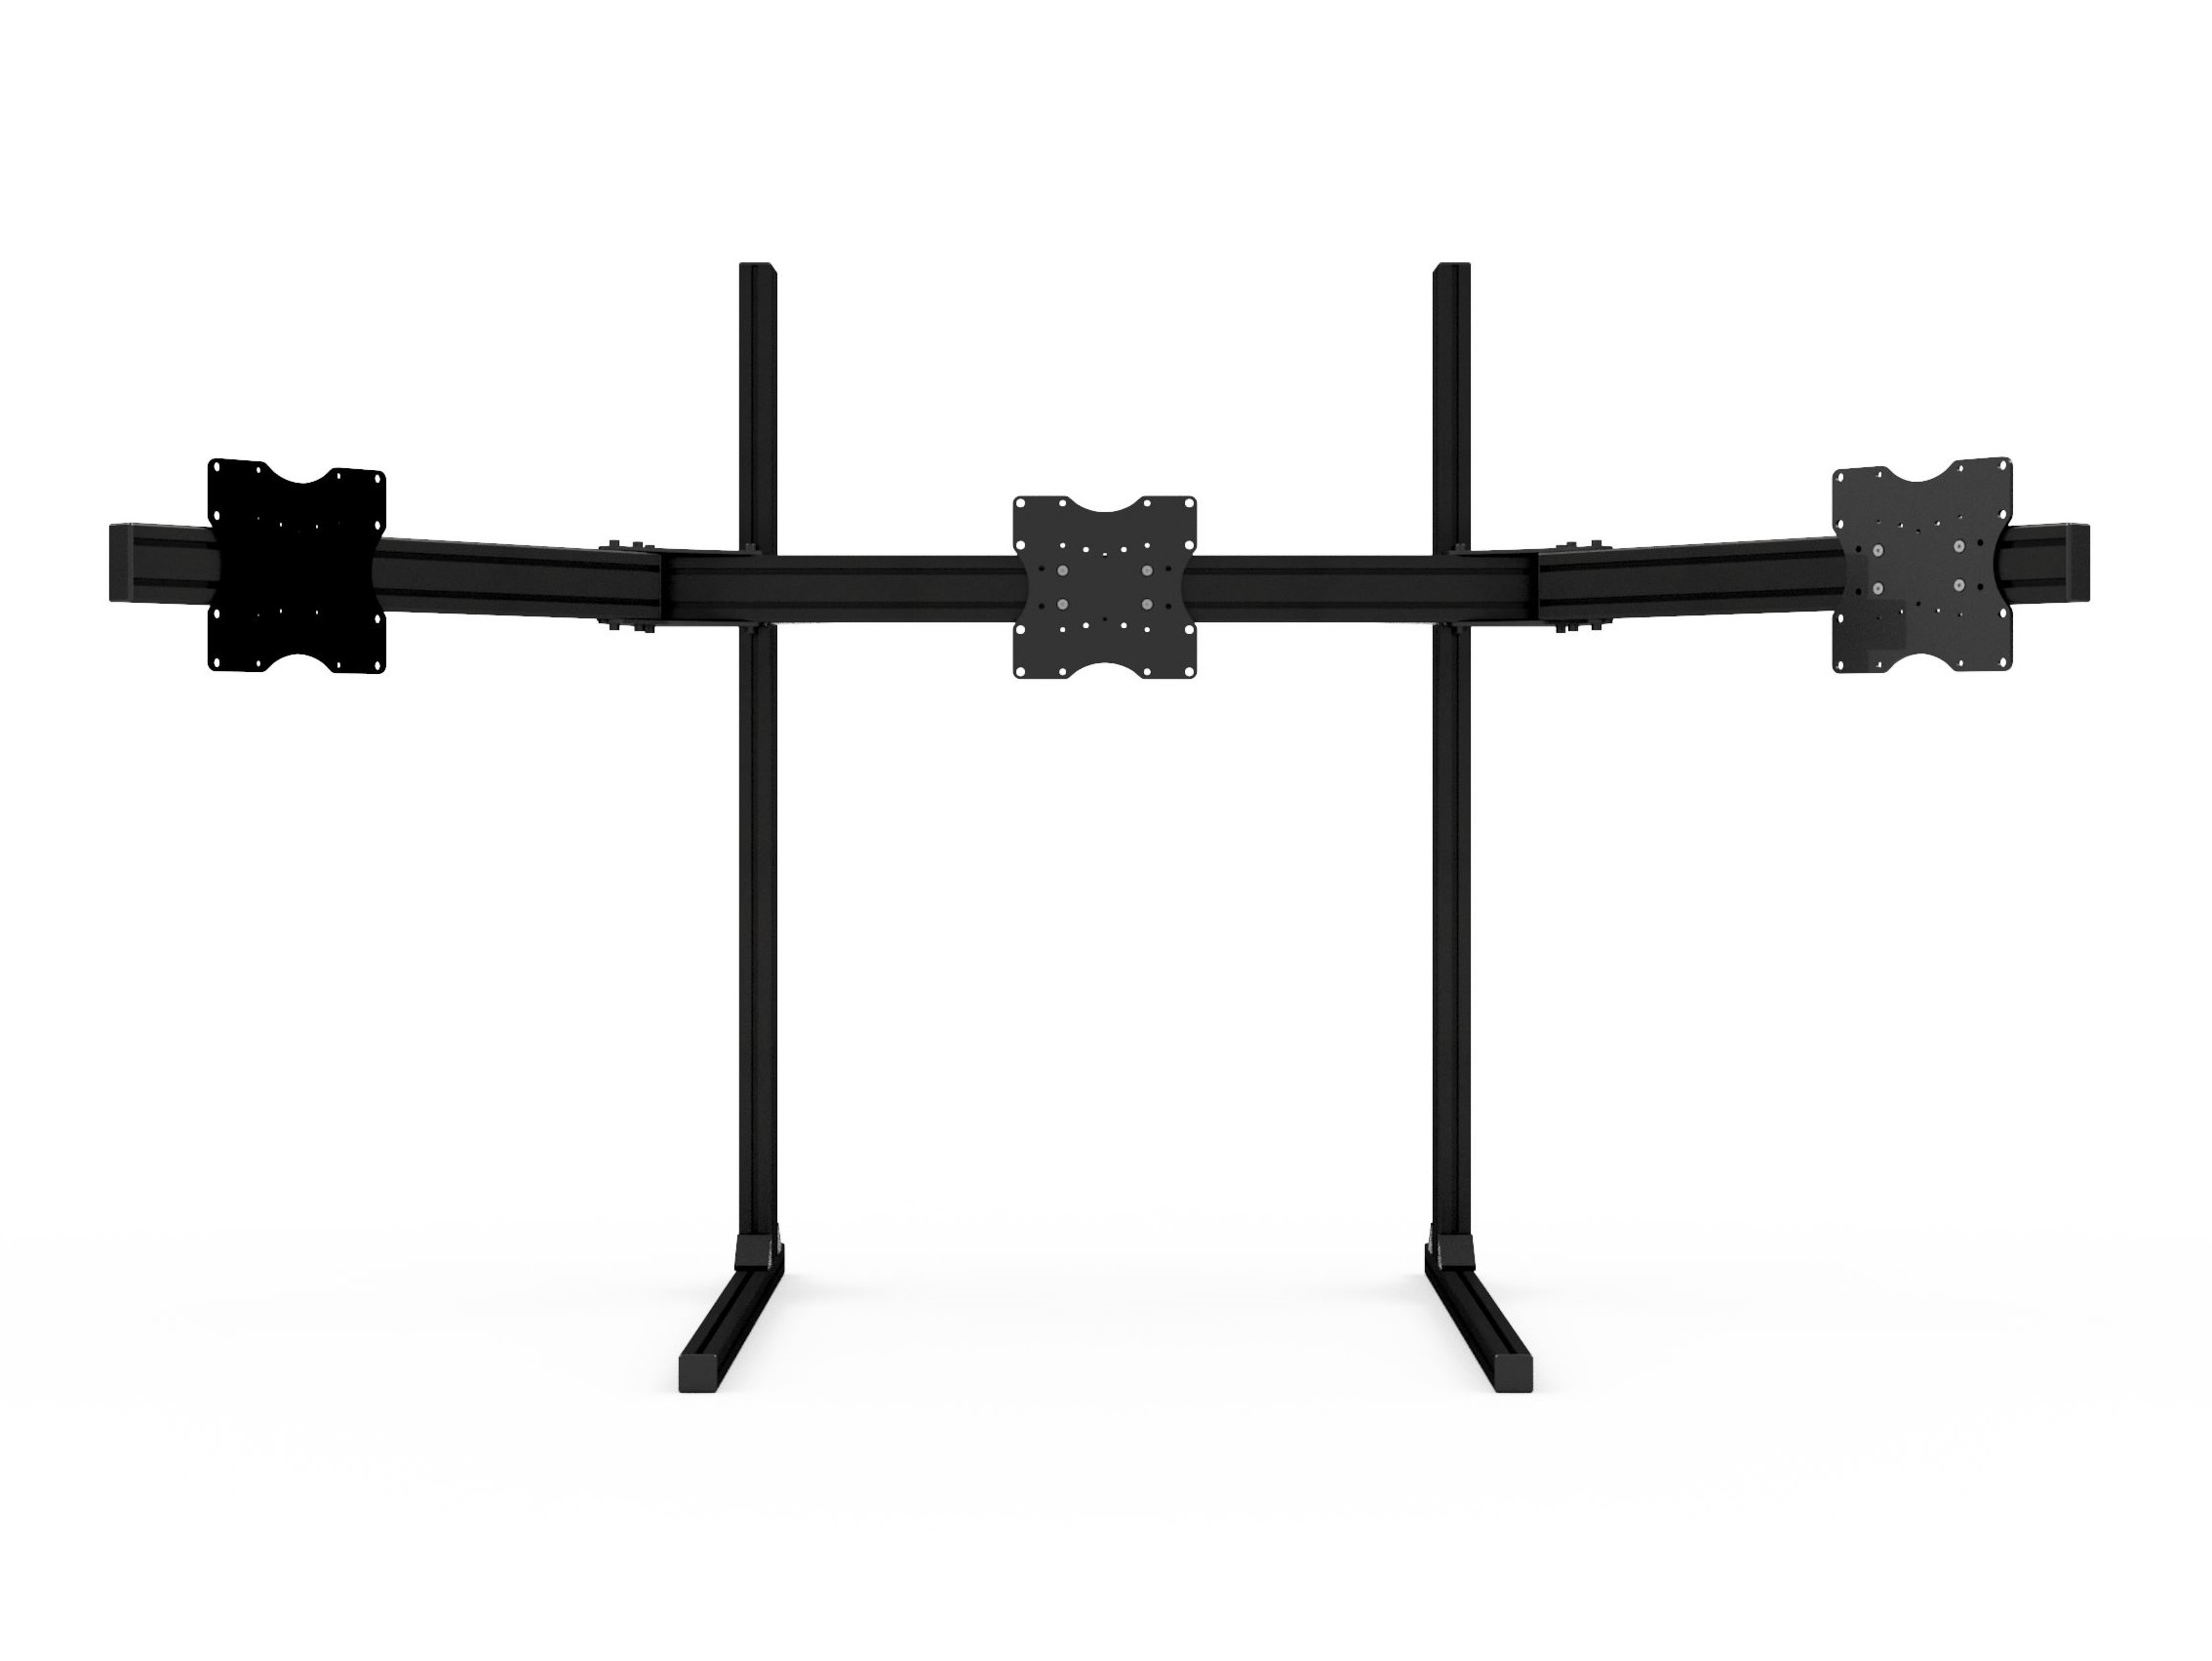 shop.gperformance.eu - Sim-Lab Triple monitor stand - VESA 100_200 - black - G-Performance